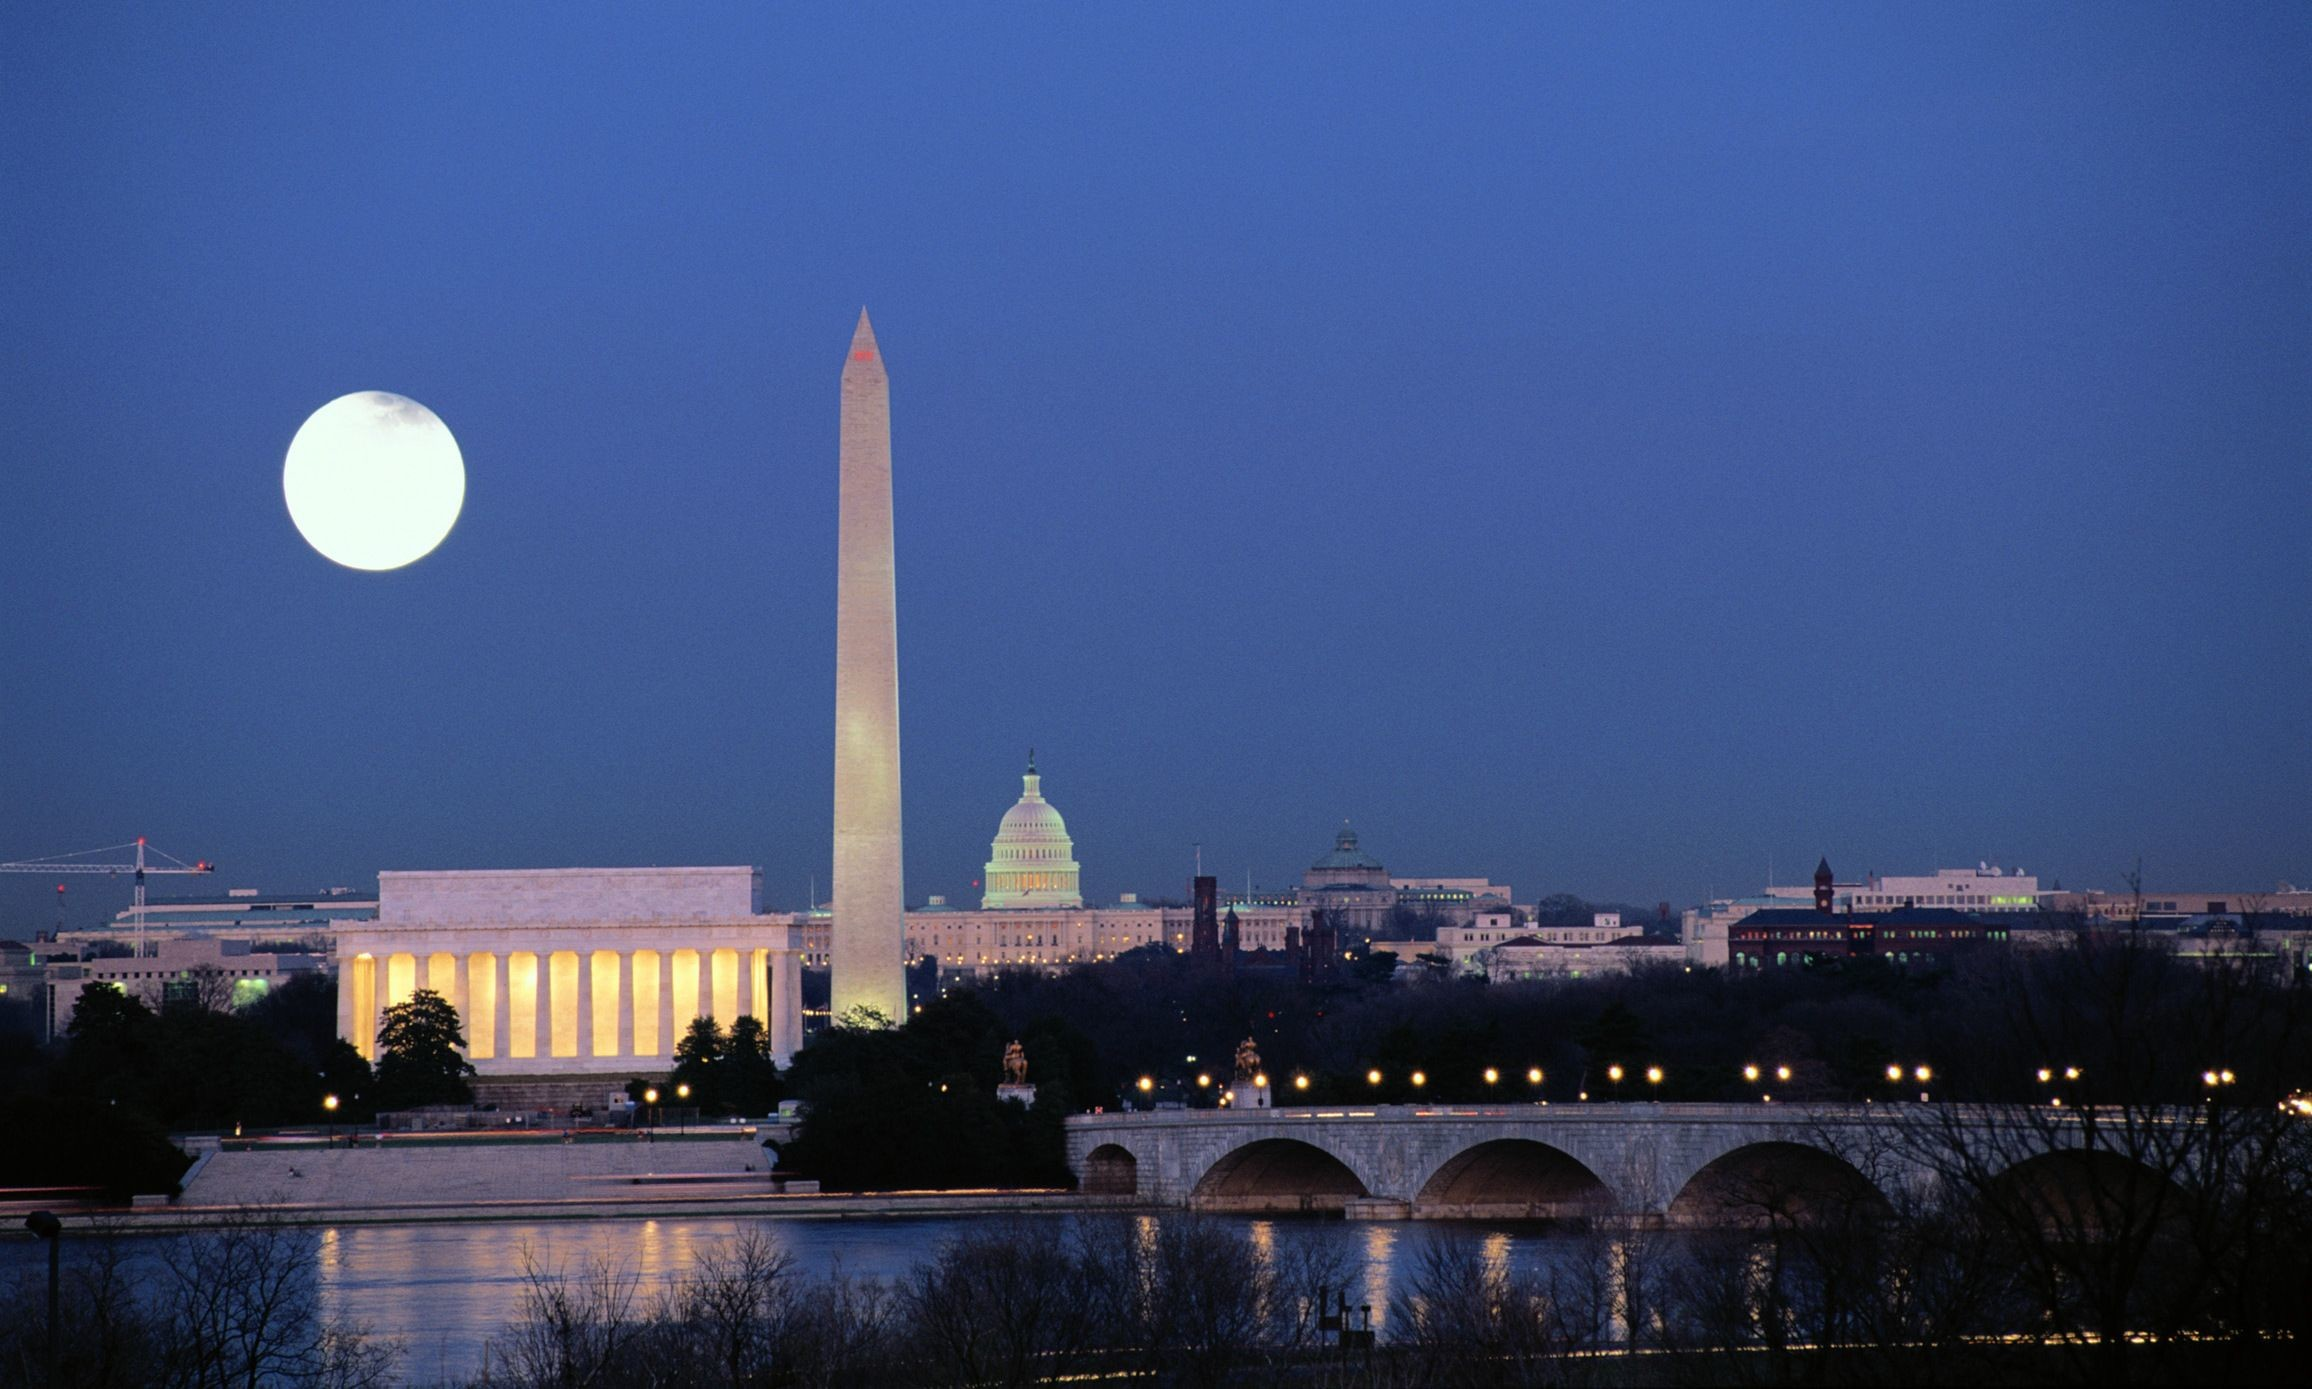 20 Washington DC Monuments at Night